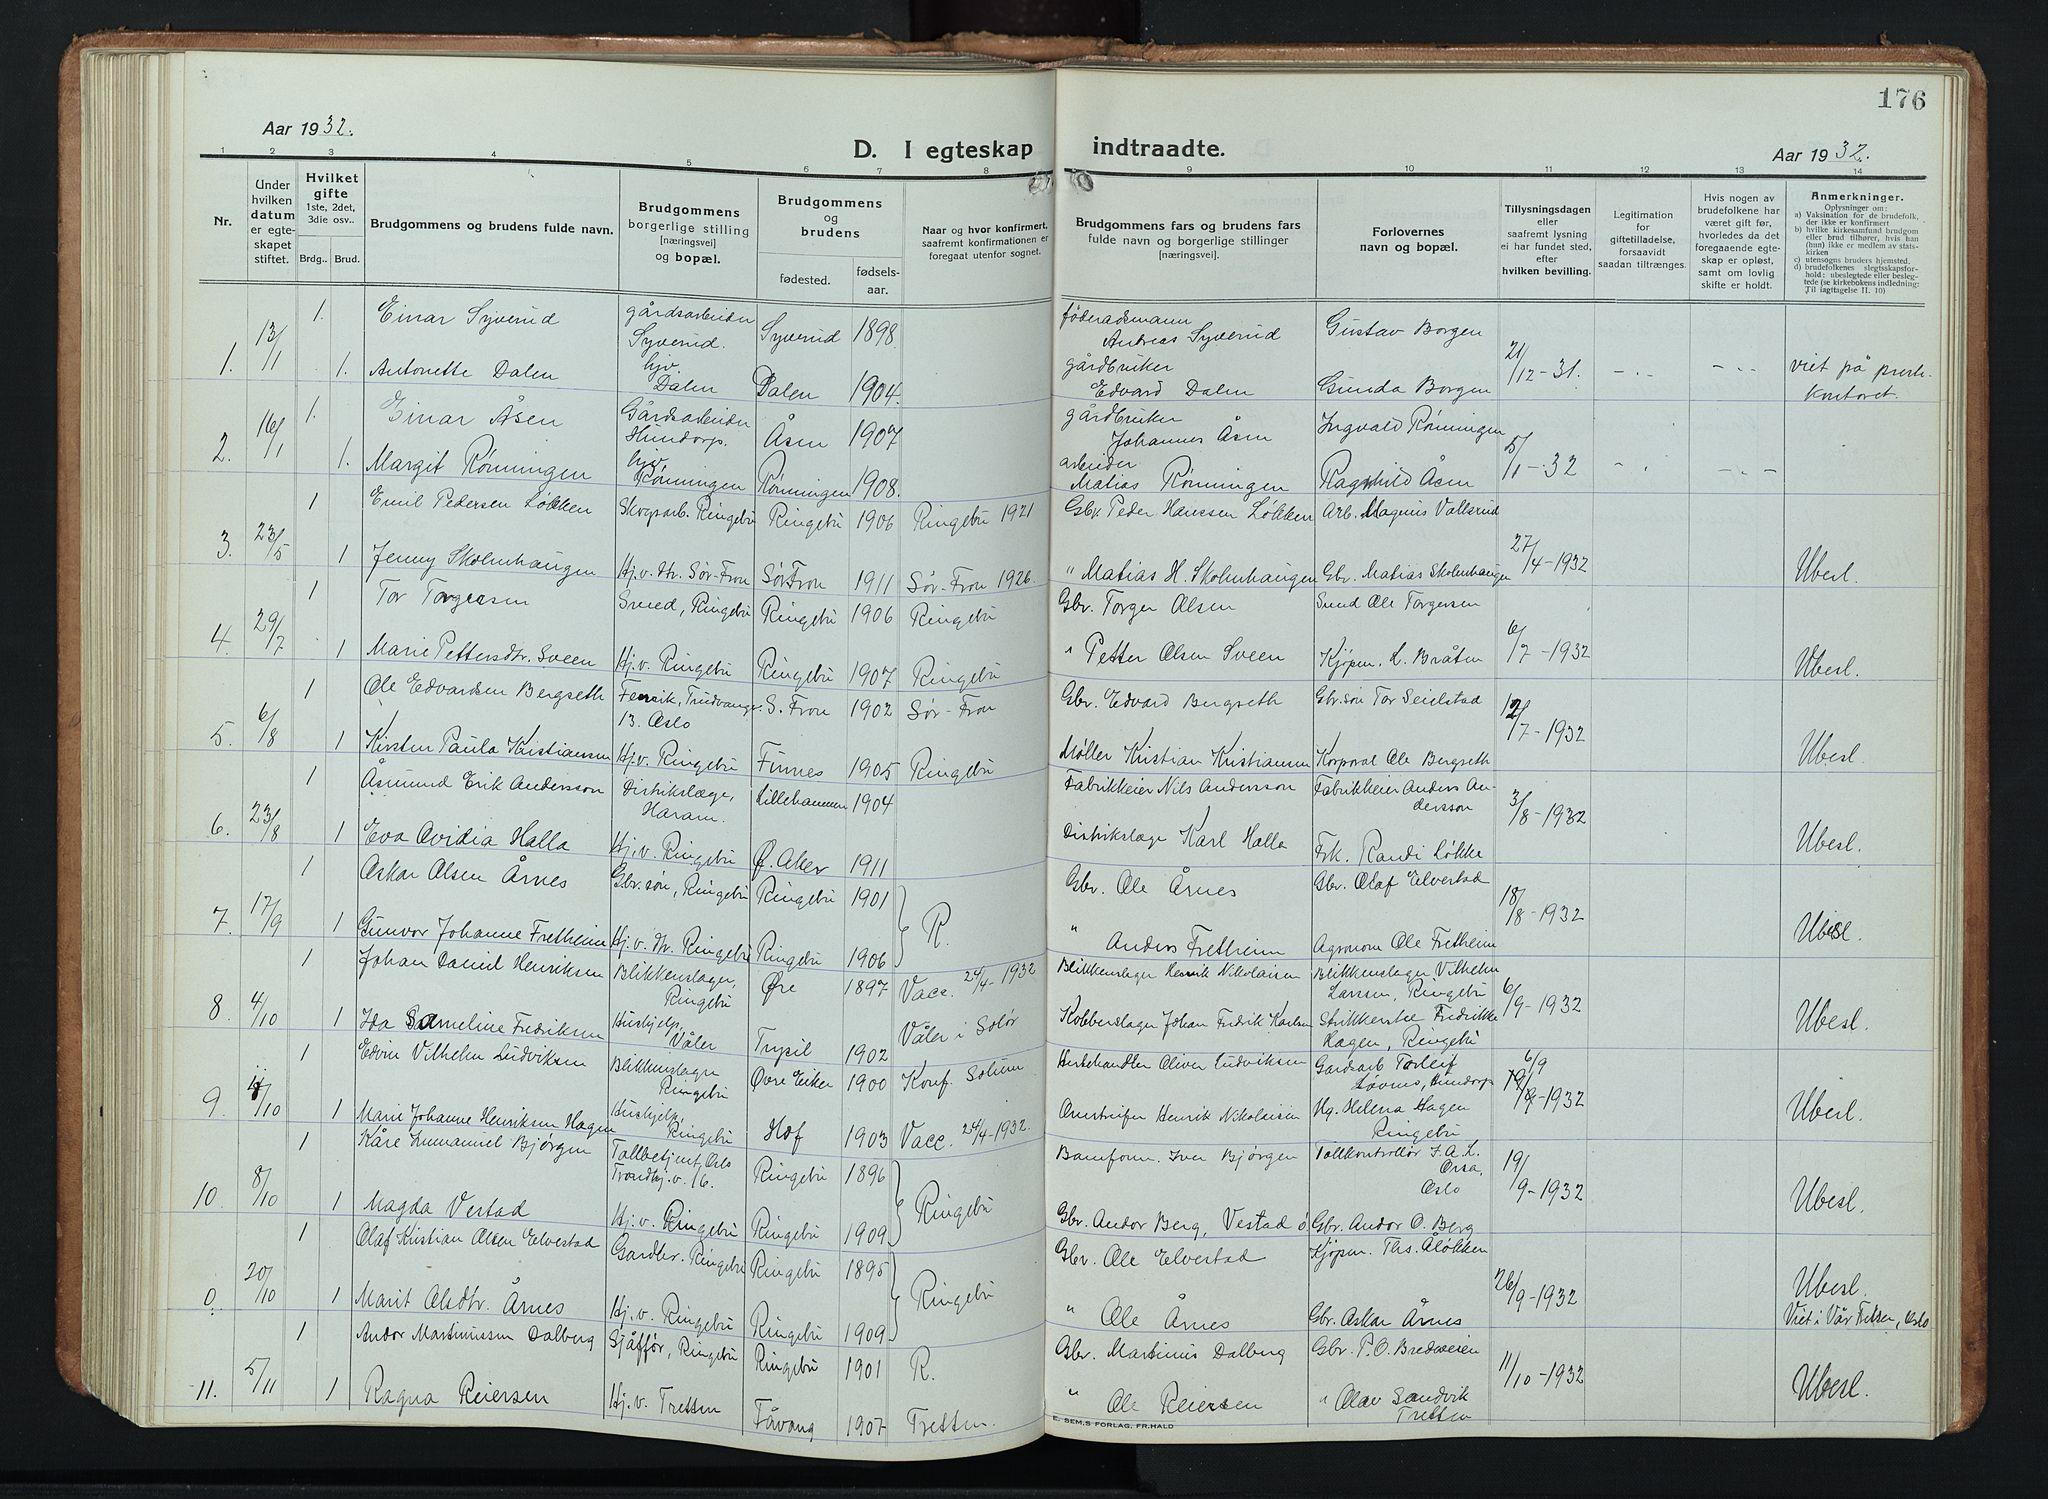 SAH, Ringebu prestekontor, Klokkerbok nr. 11, 1921-1943, s. 176